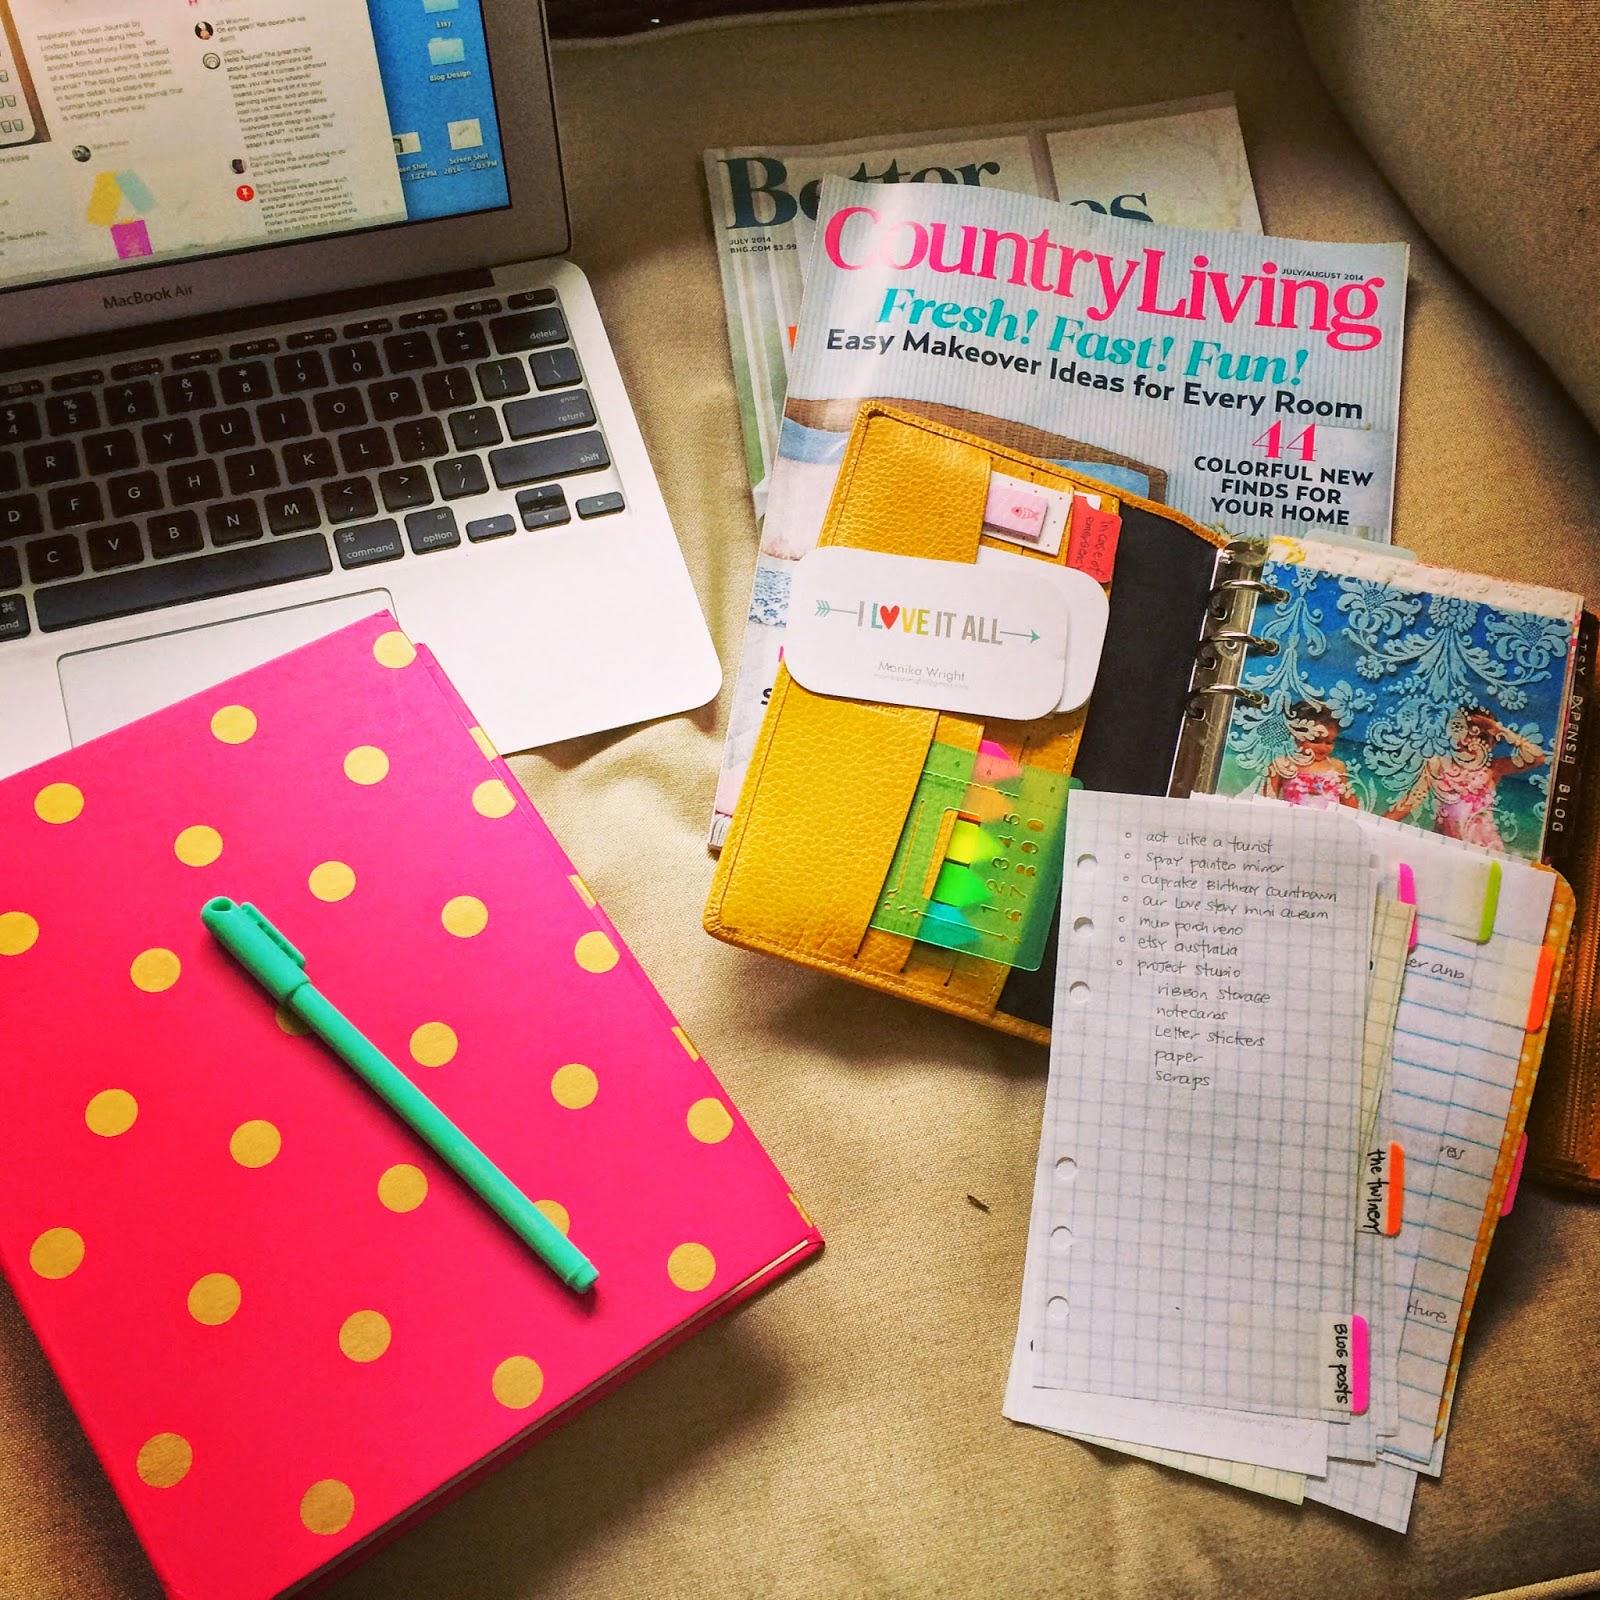 Blog Planning in your Filofax Planner | iloveitallwithmonikawright.com